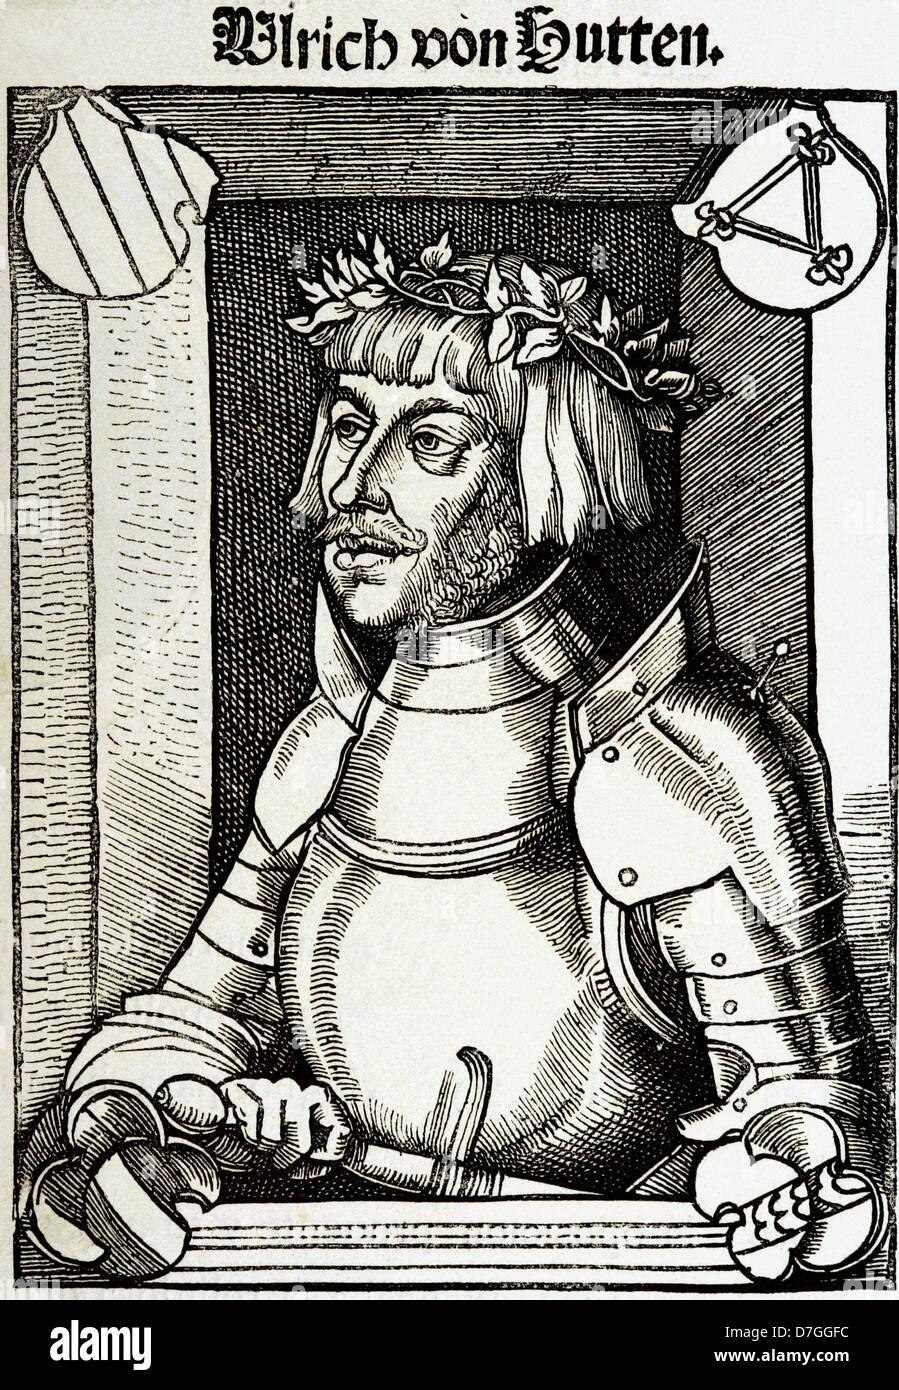 Ulrich von Hutten (1488-1523). German writer and theologian. Engraving. Stock Photo